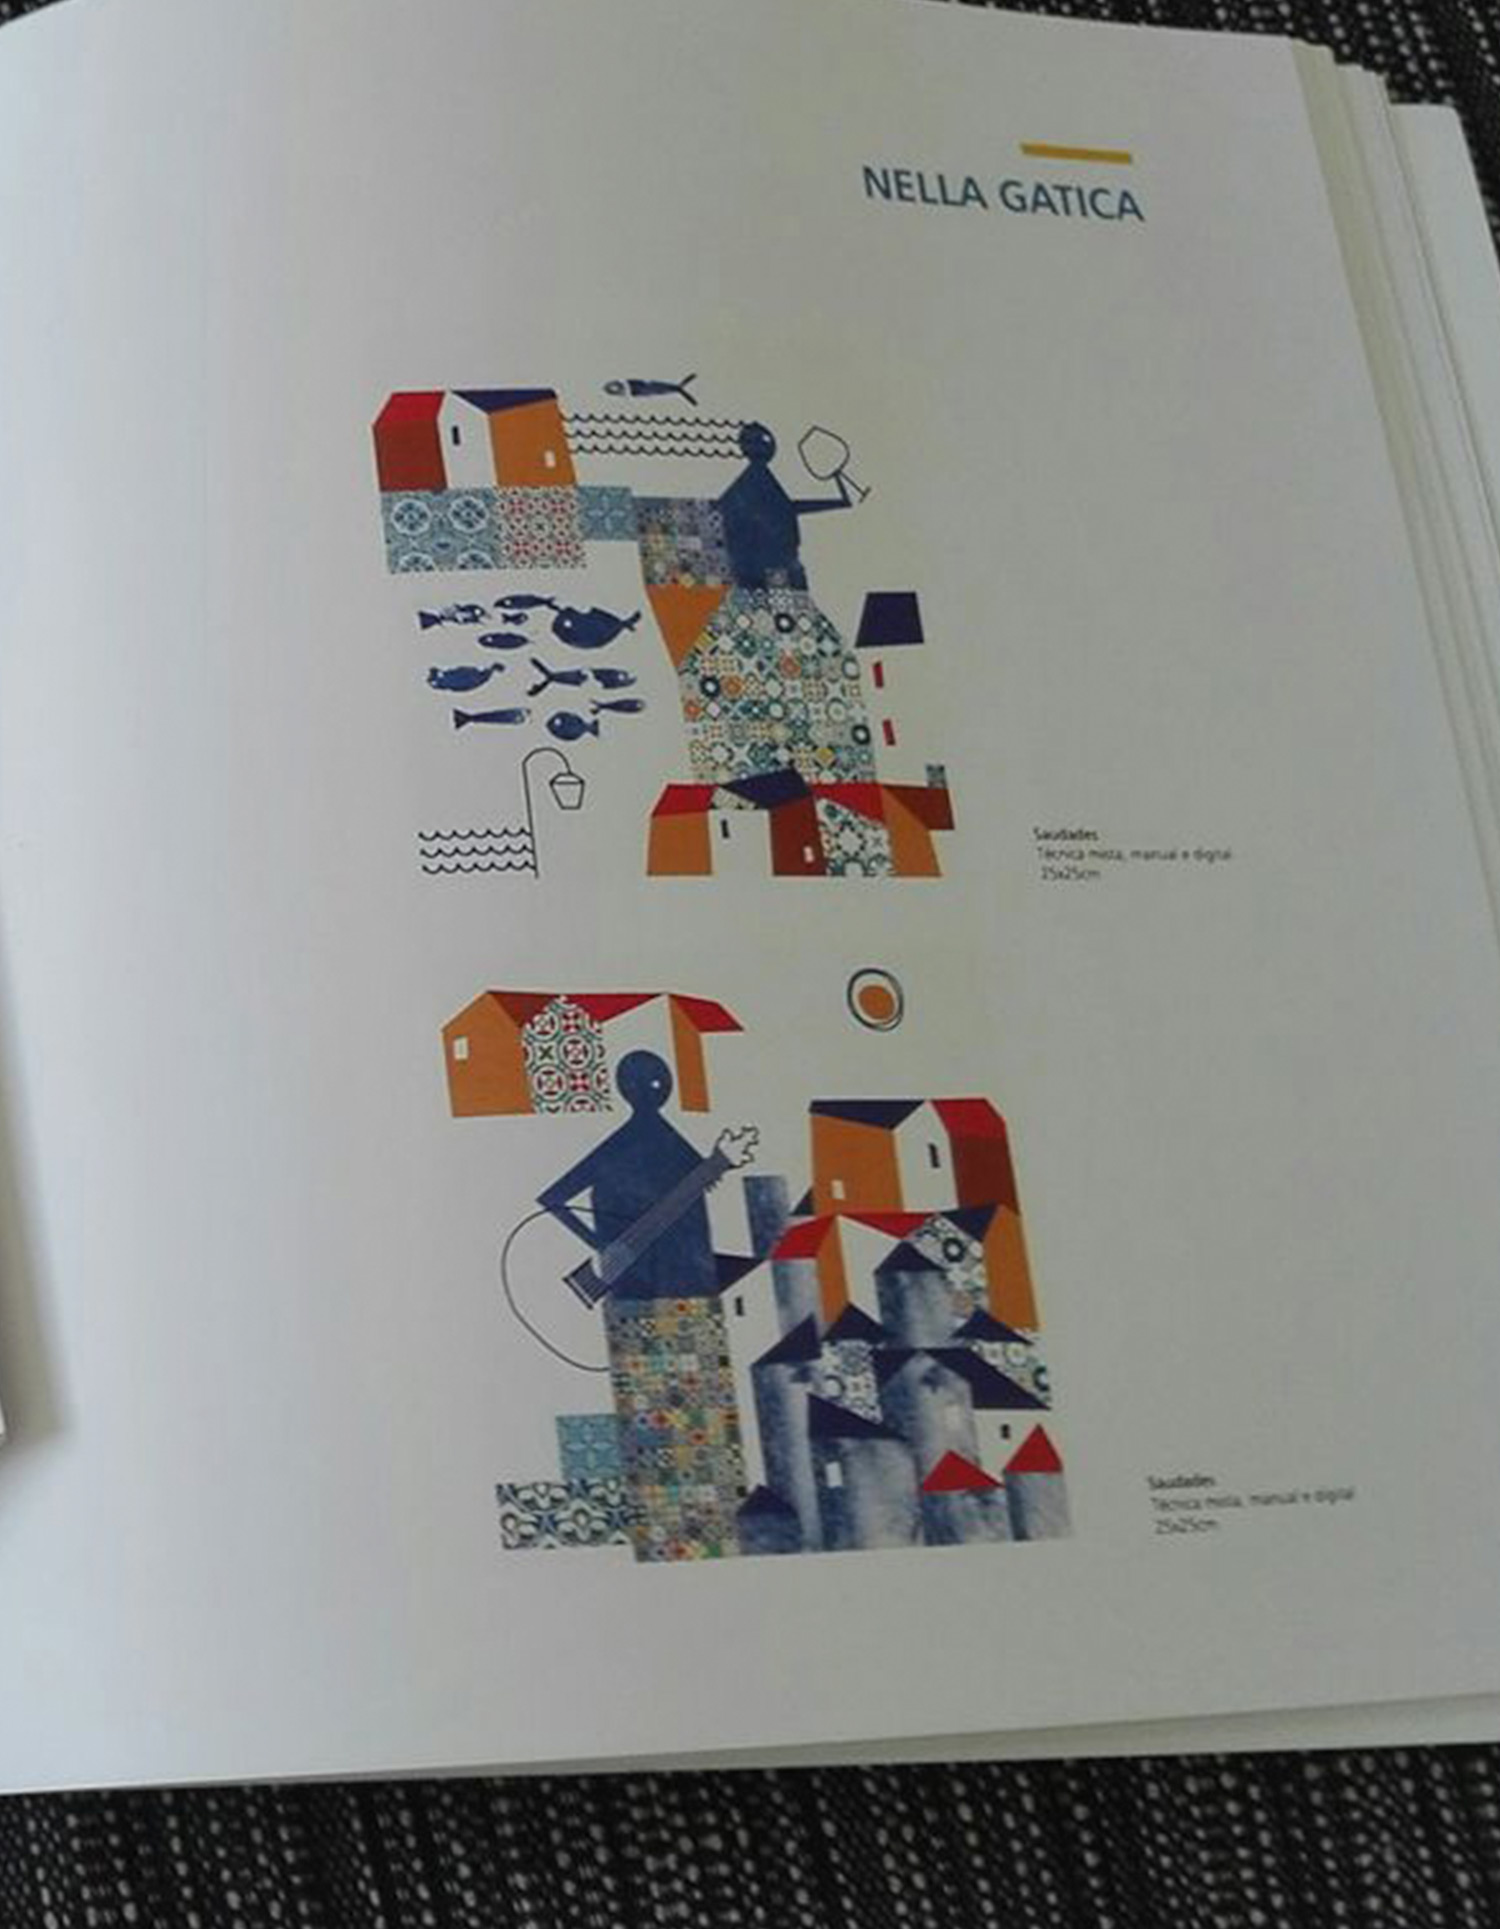 Nella Gatica - Author and illustrator